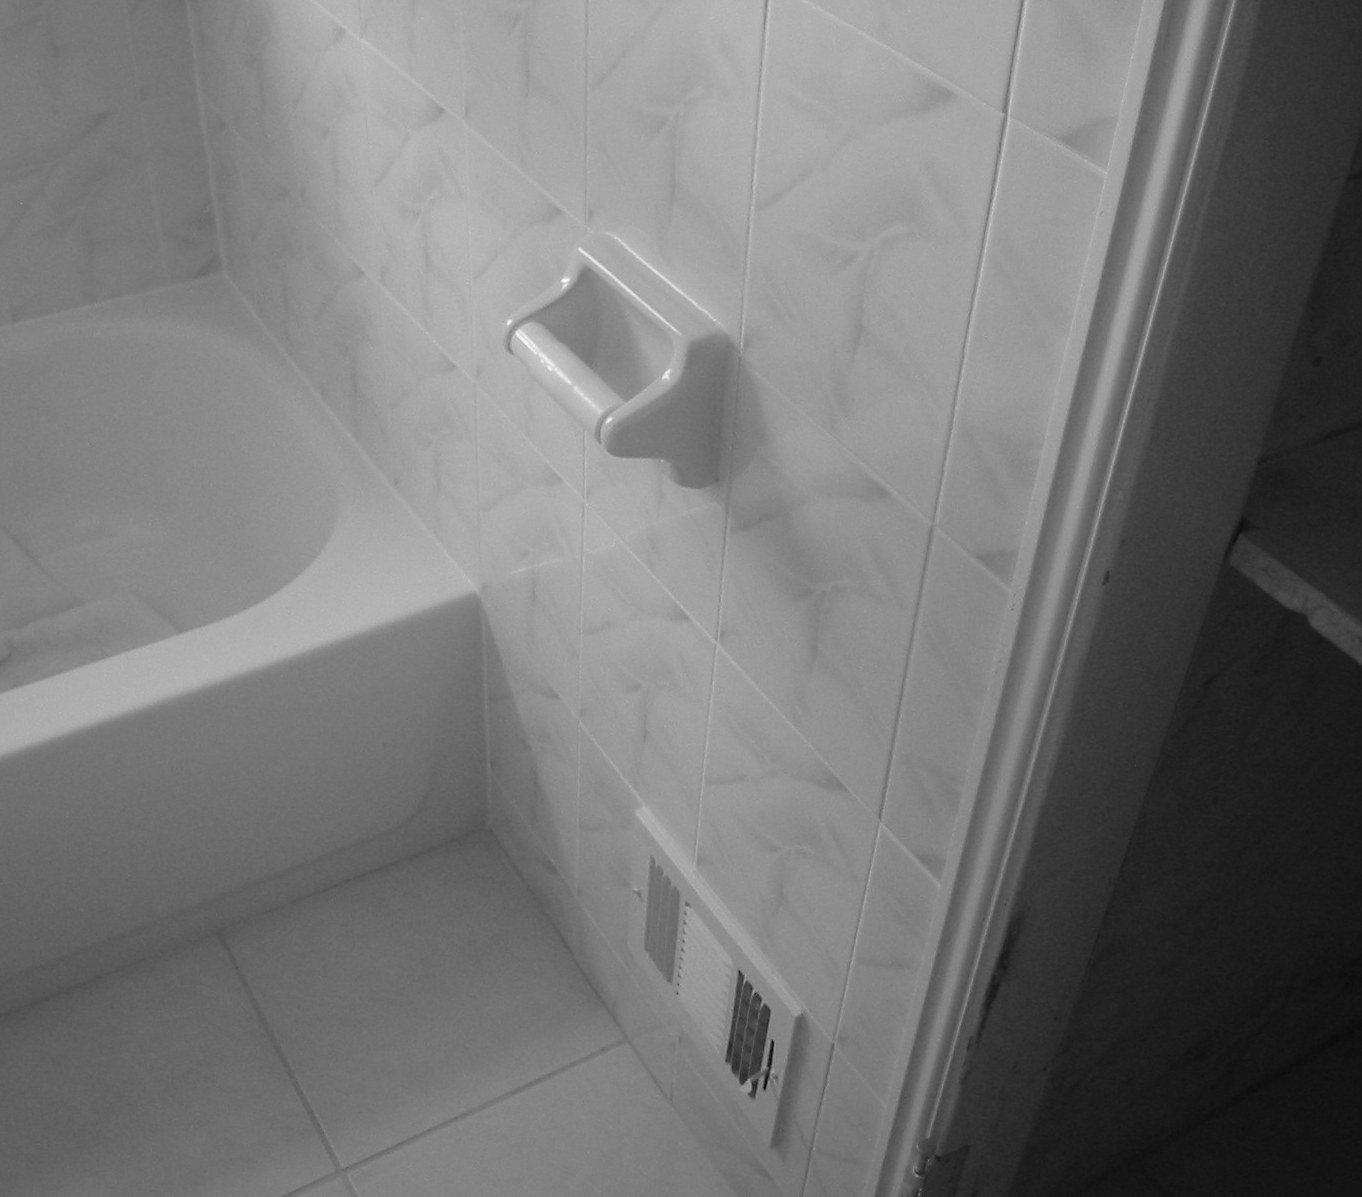 Daltile Bath Accessories toilet paper Holder Arctic White by Daltile